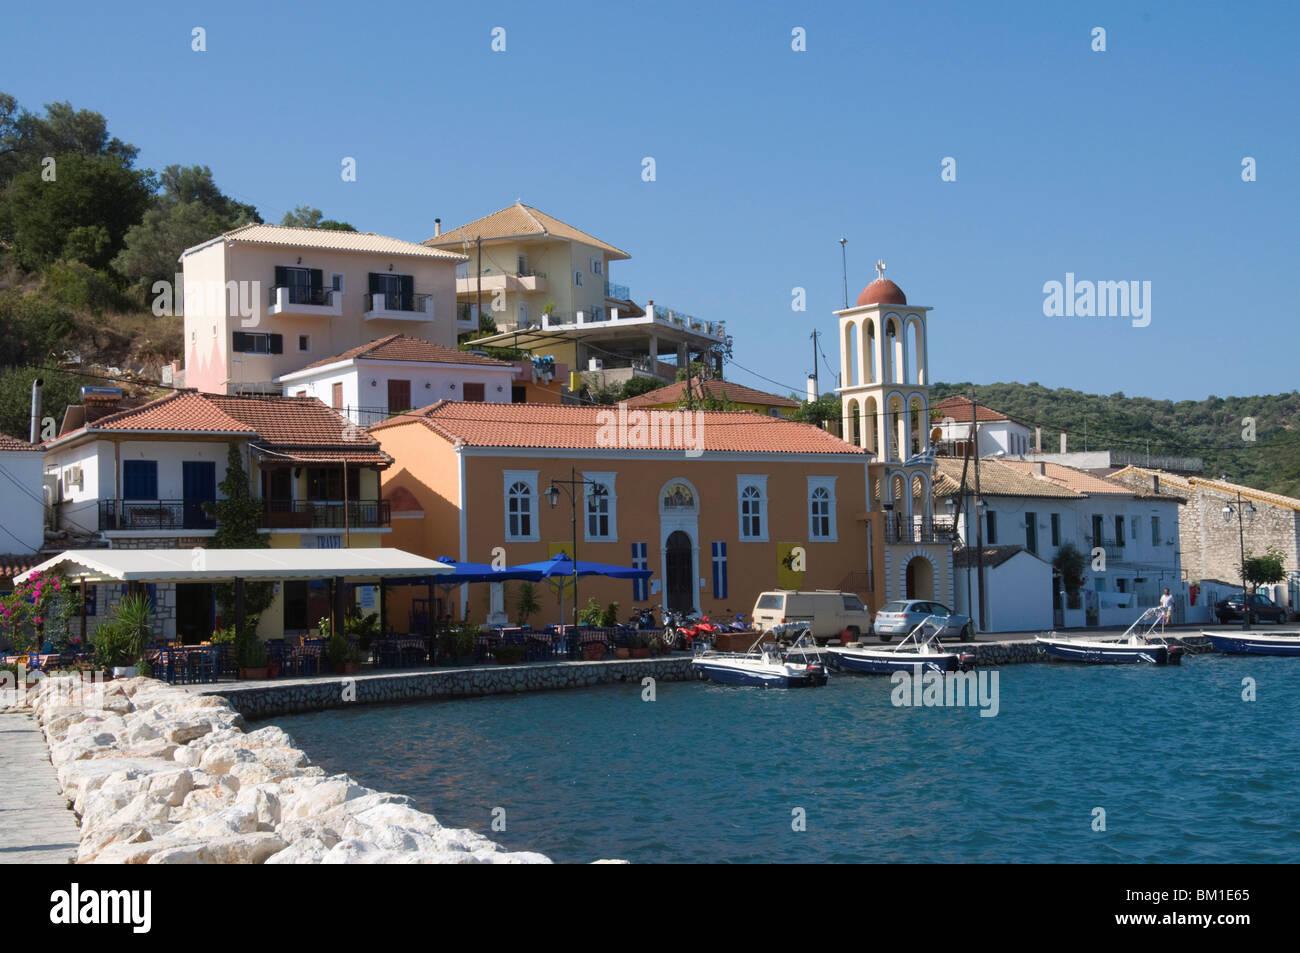 Vathi, Meganisi, Ionian Islands, Greek Islands, Greece, Europe - Stock Image